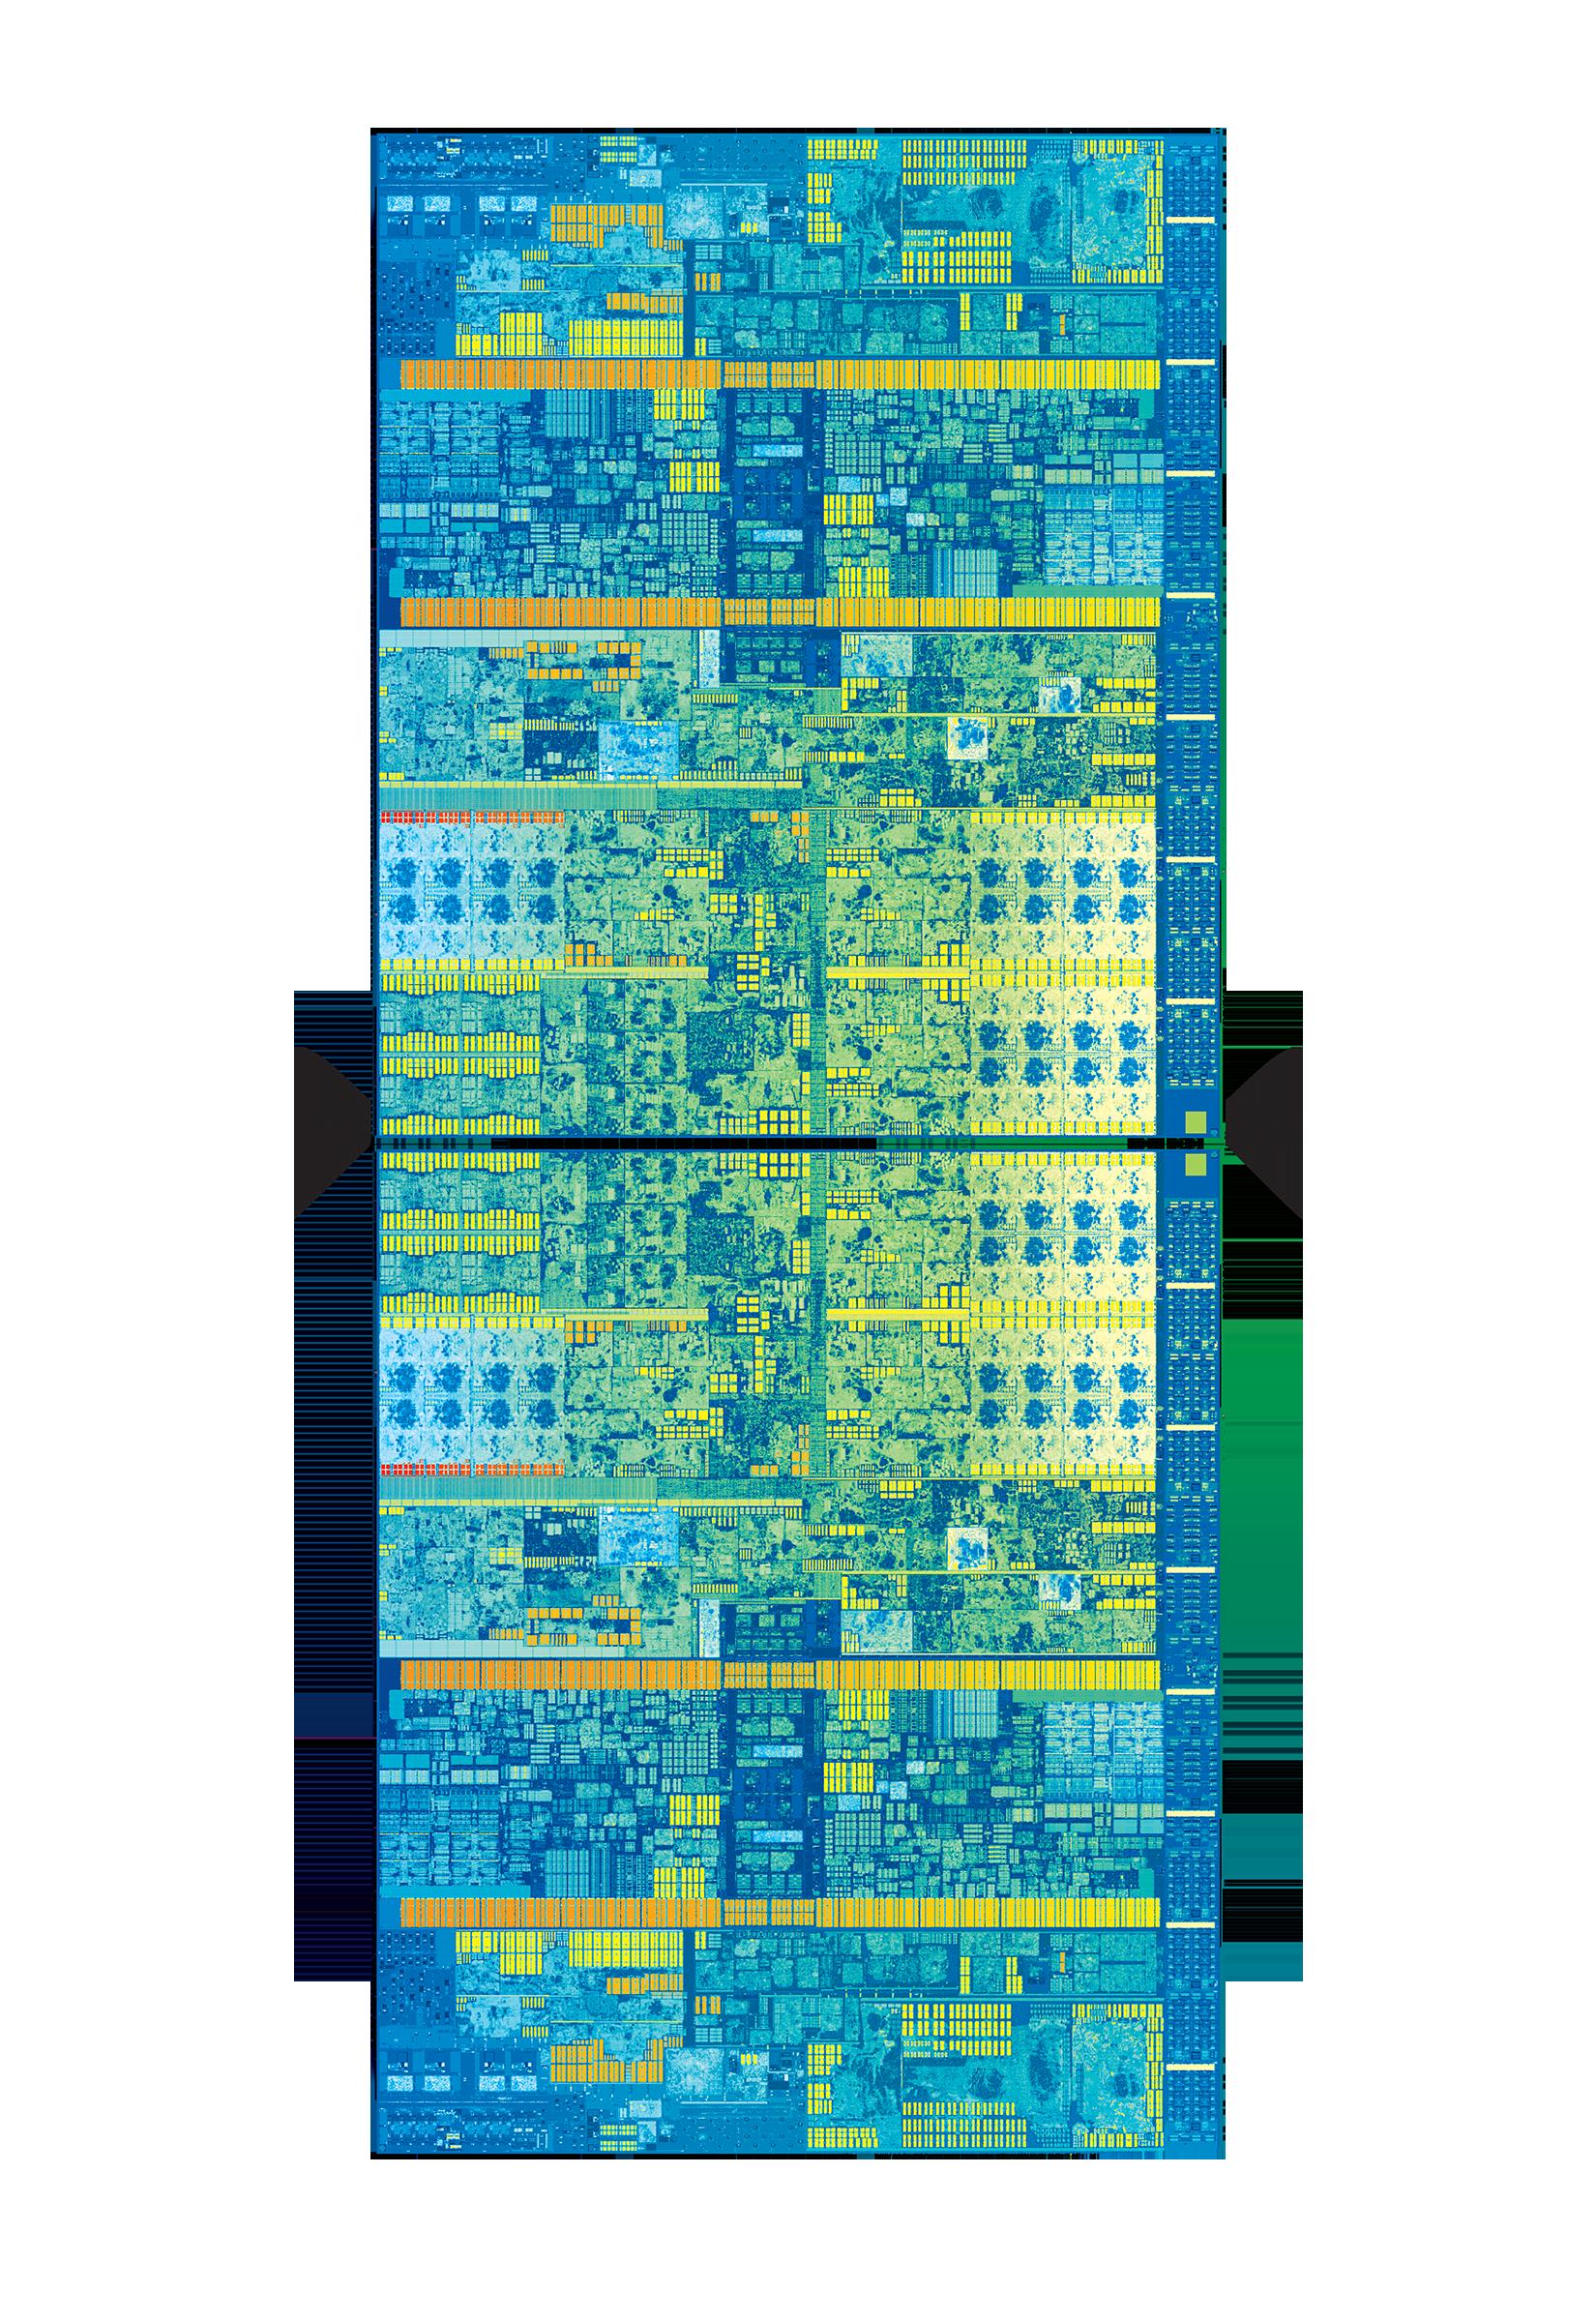 7th Gen Intel Core die with mirror effect